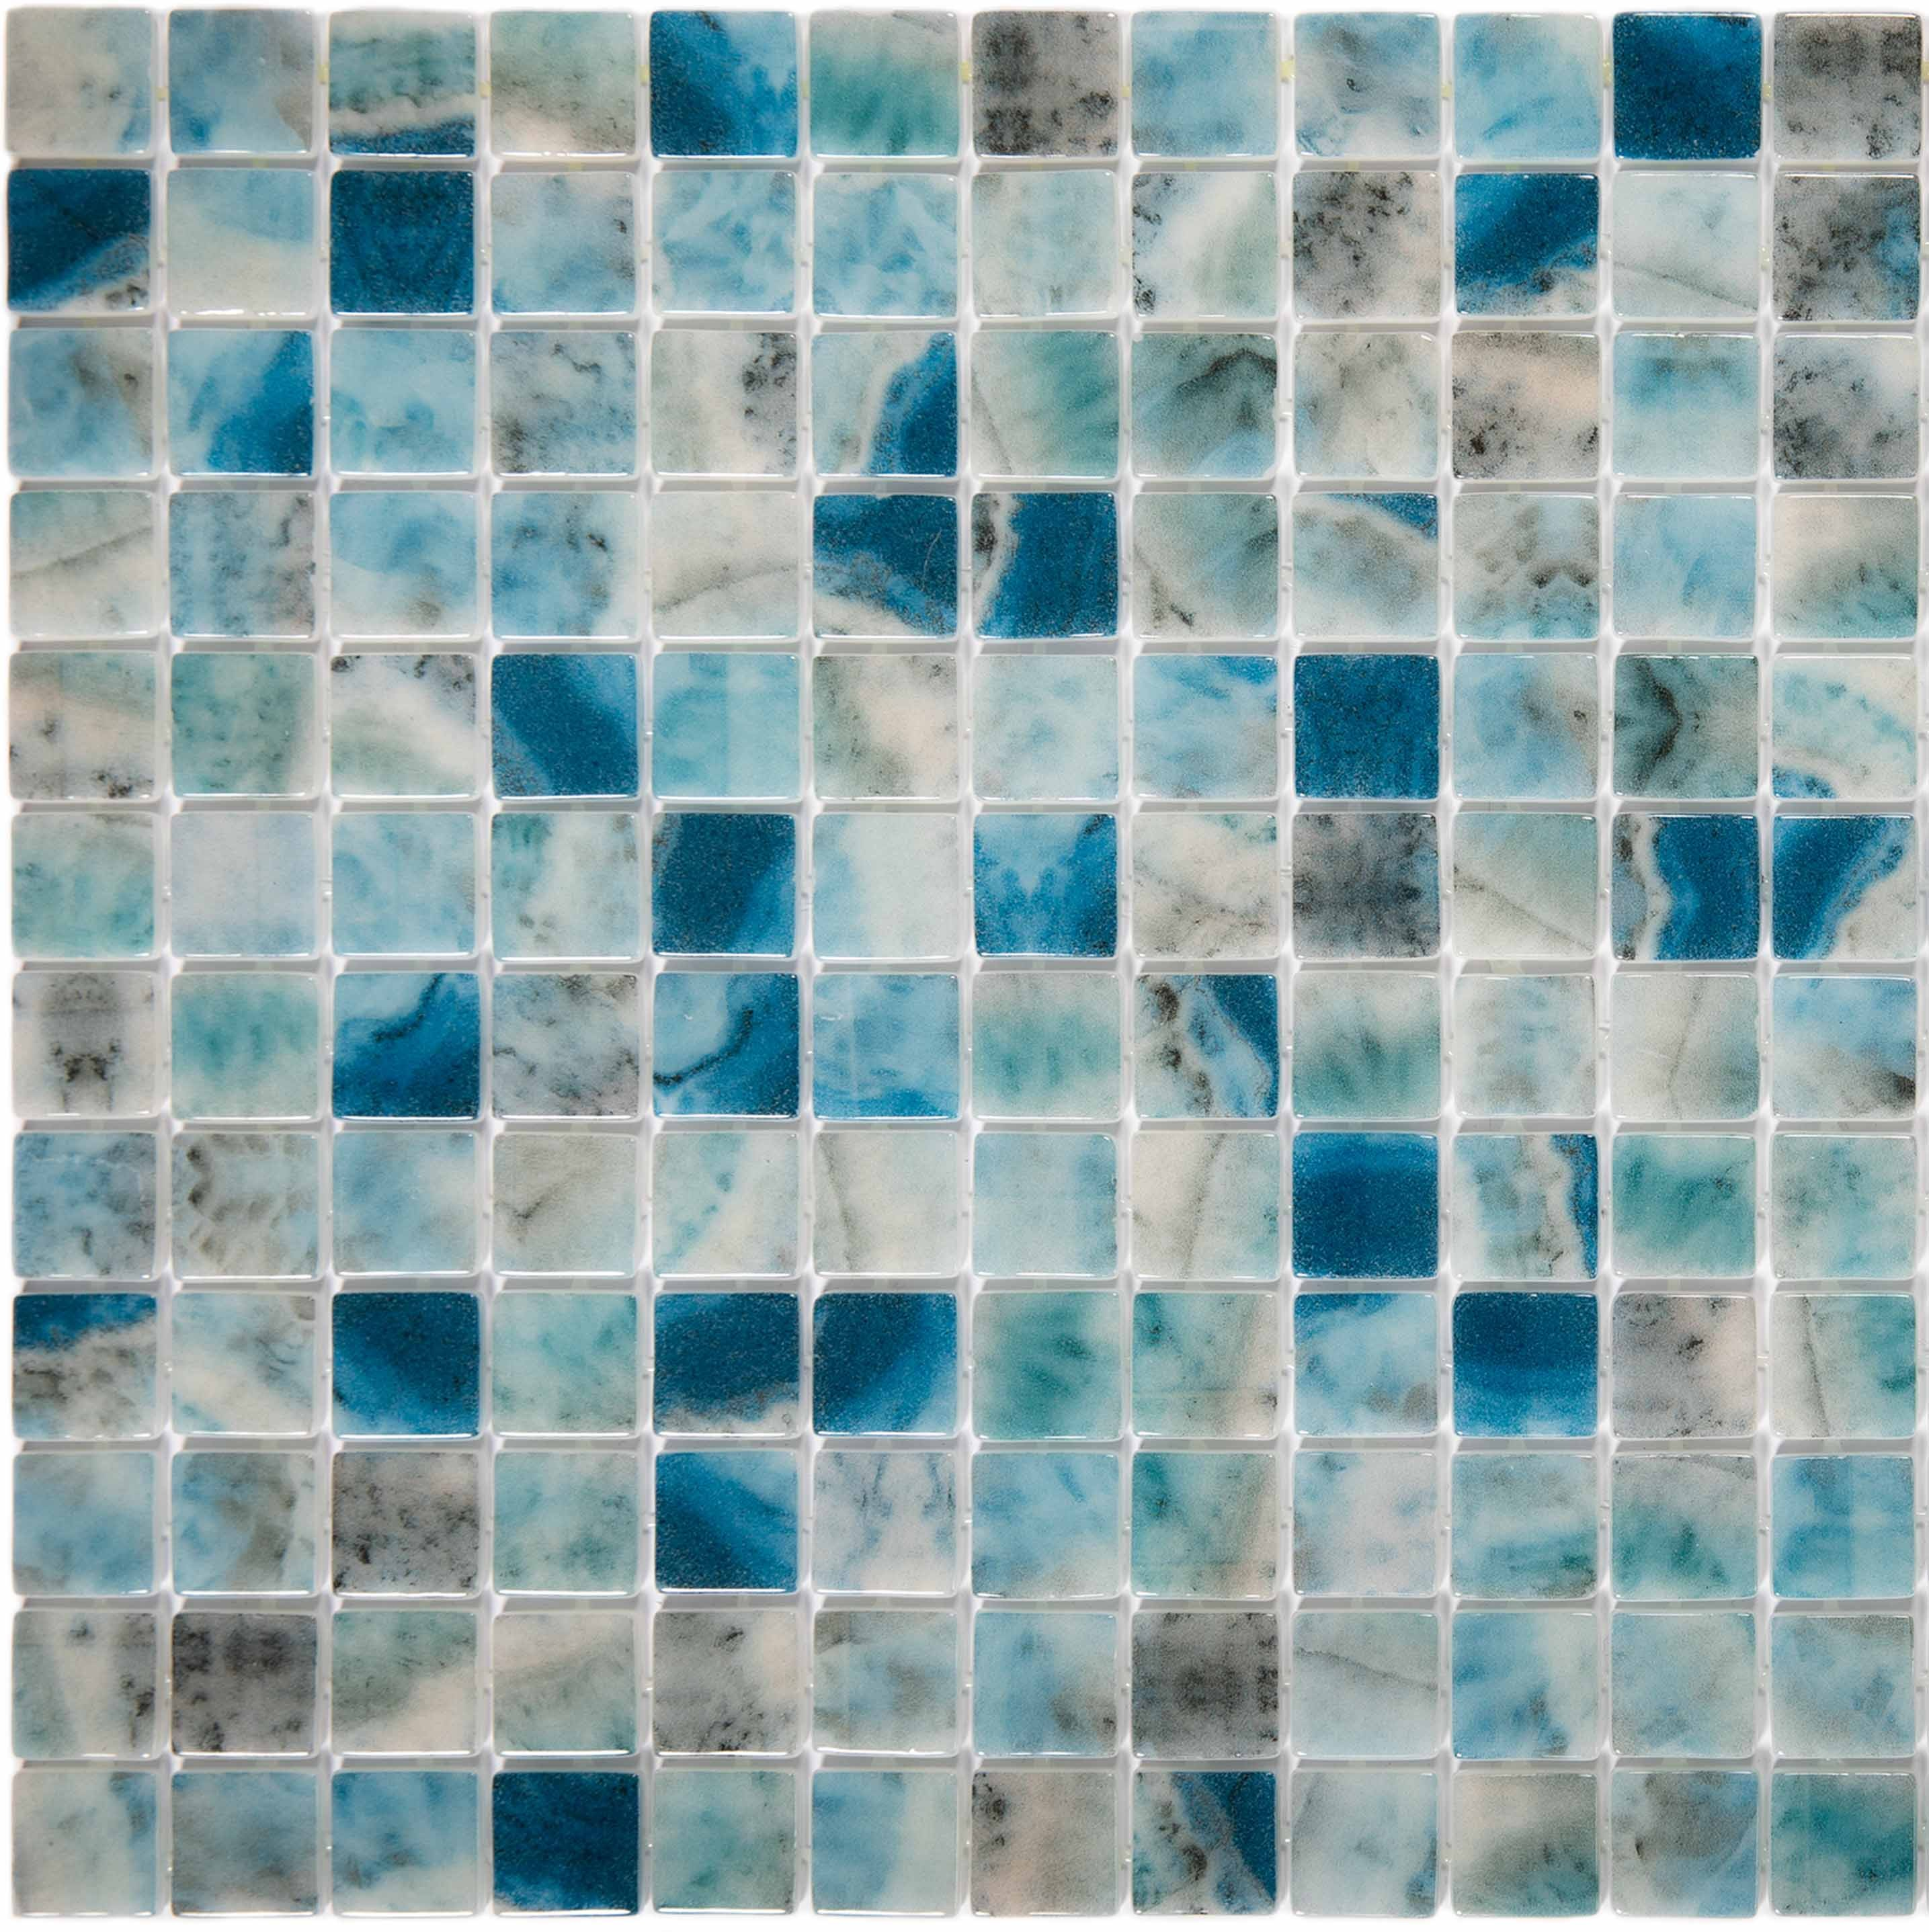 Pool-Tiles Hero Onix Drift-hero-gallery-2